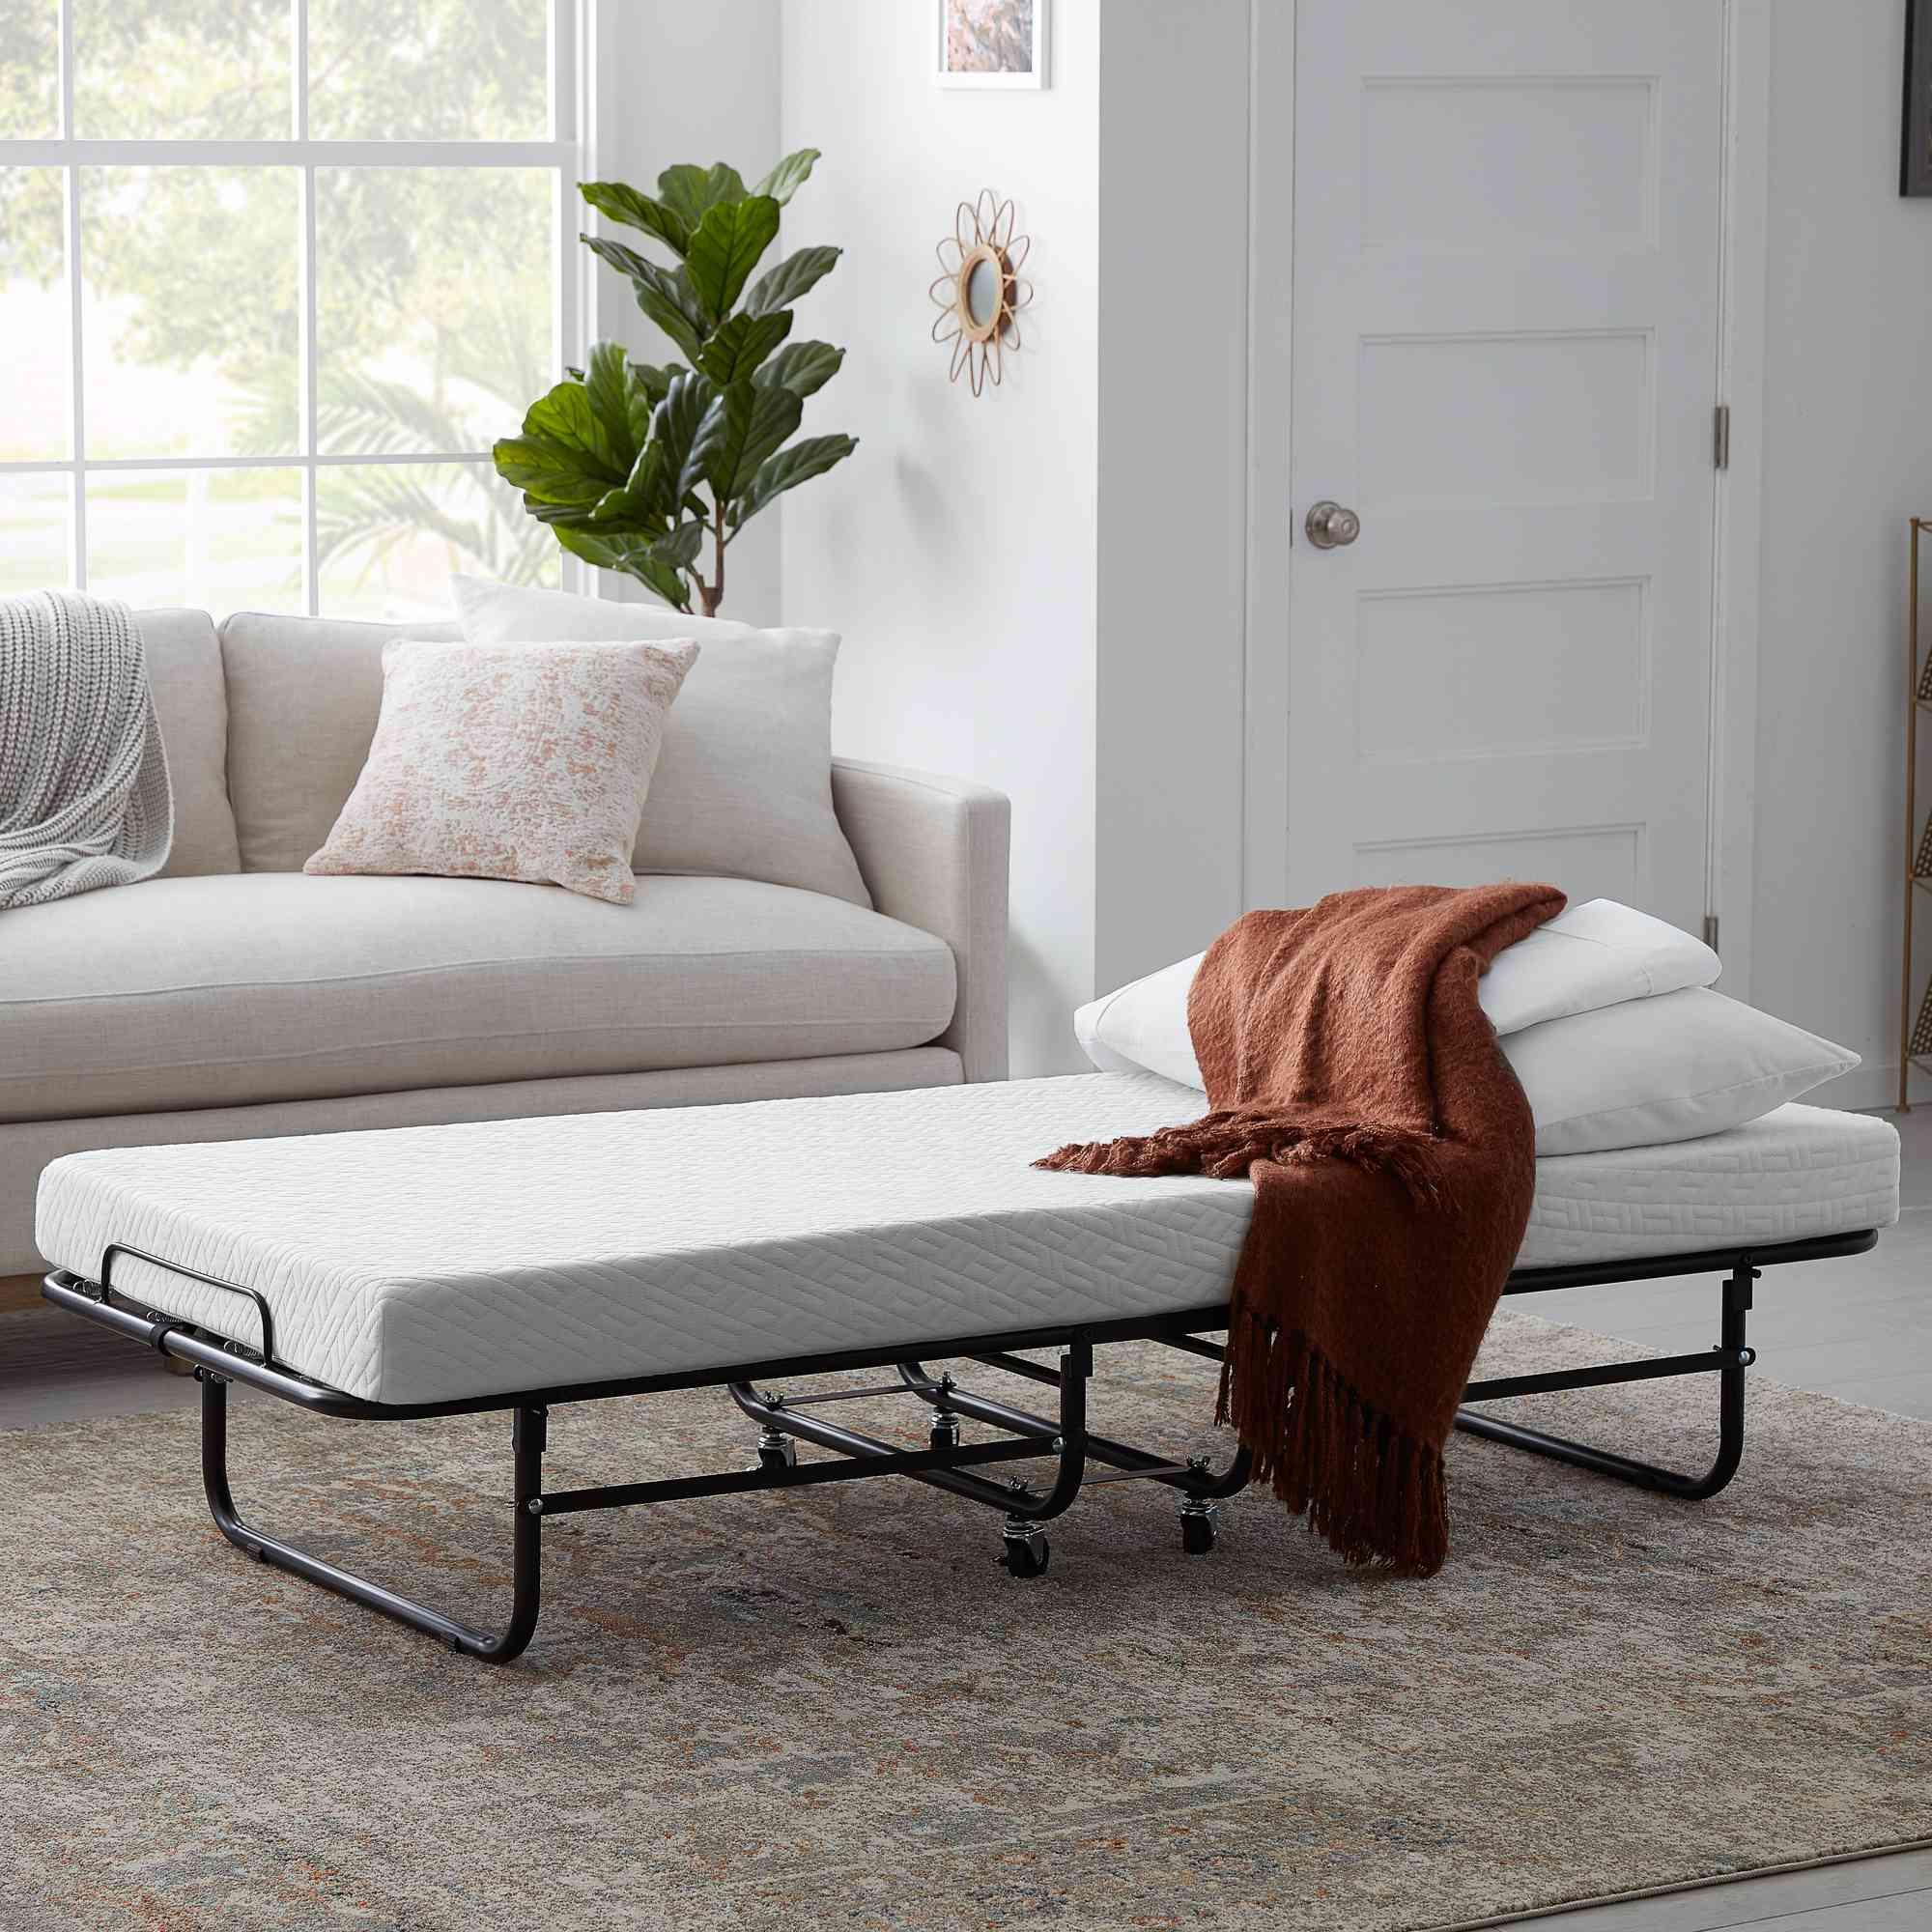 Rest Haven Suspension Rollaway Bed with Gel Memory Foam Mattress